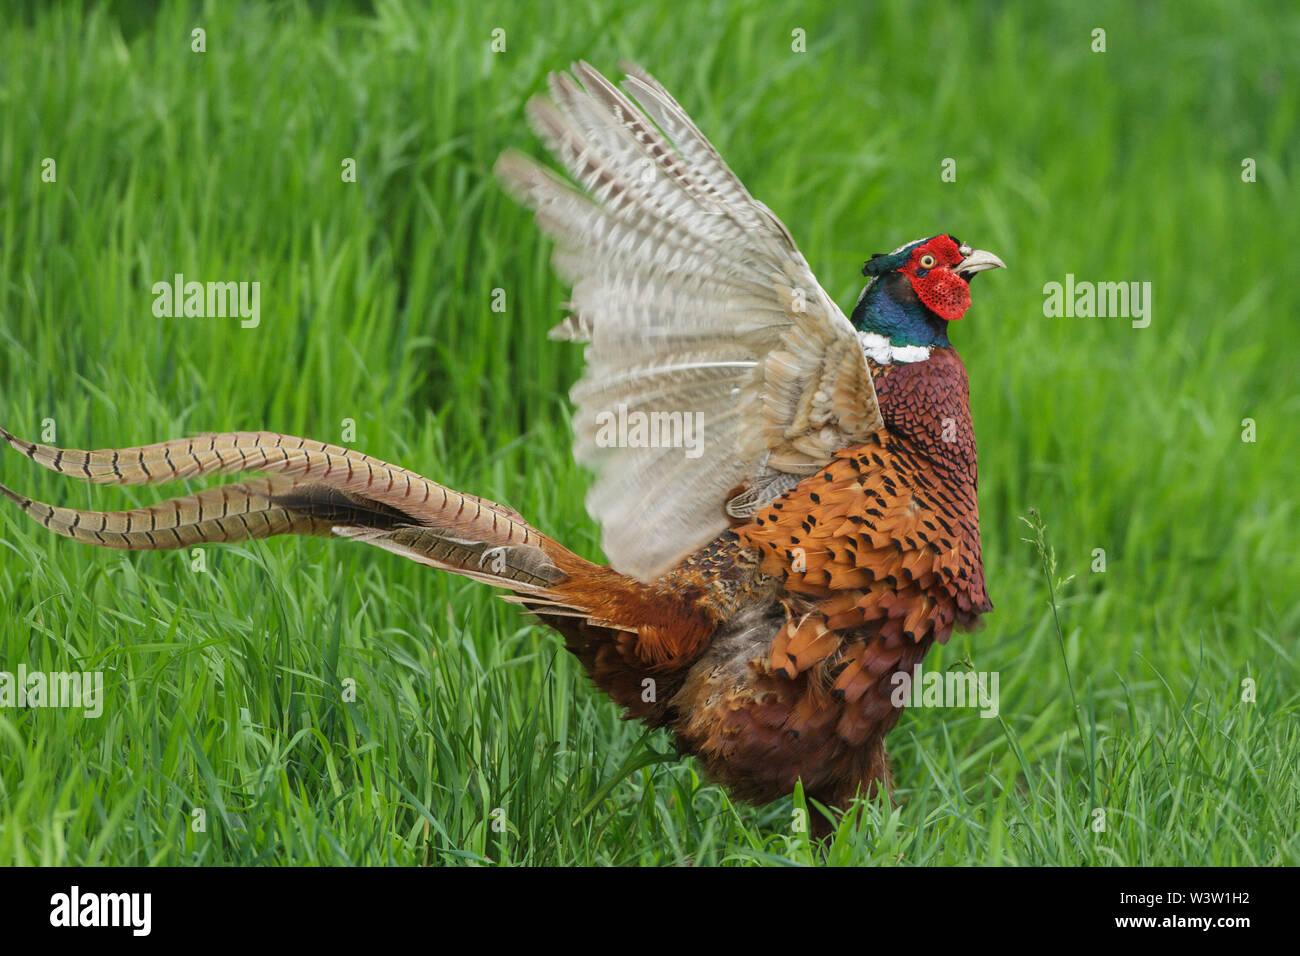 Common pheasant, Fasan (Phasianus colchicus) Männchen beim Balzruf Stock Photo